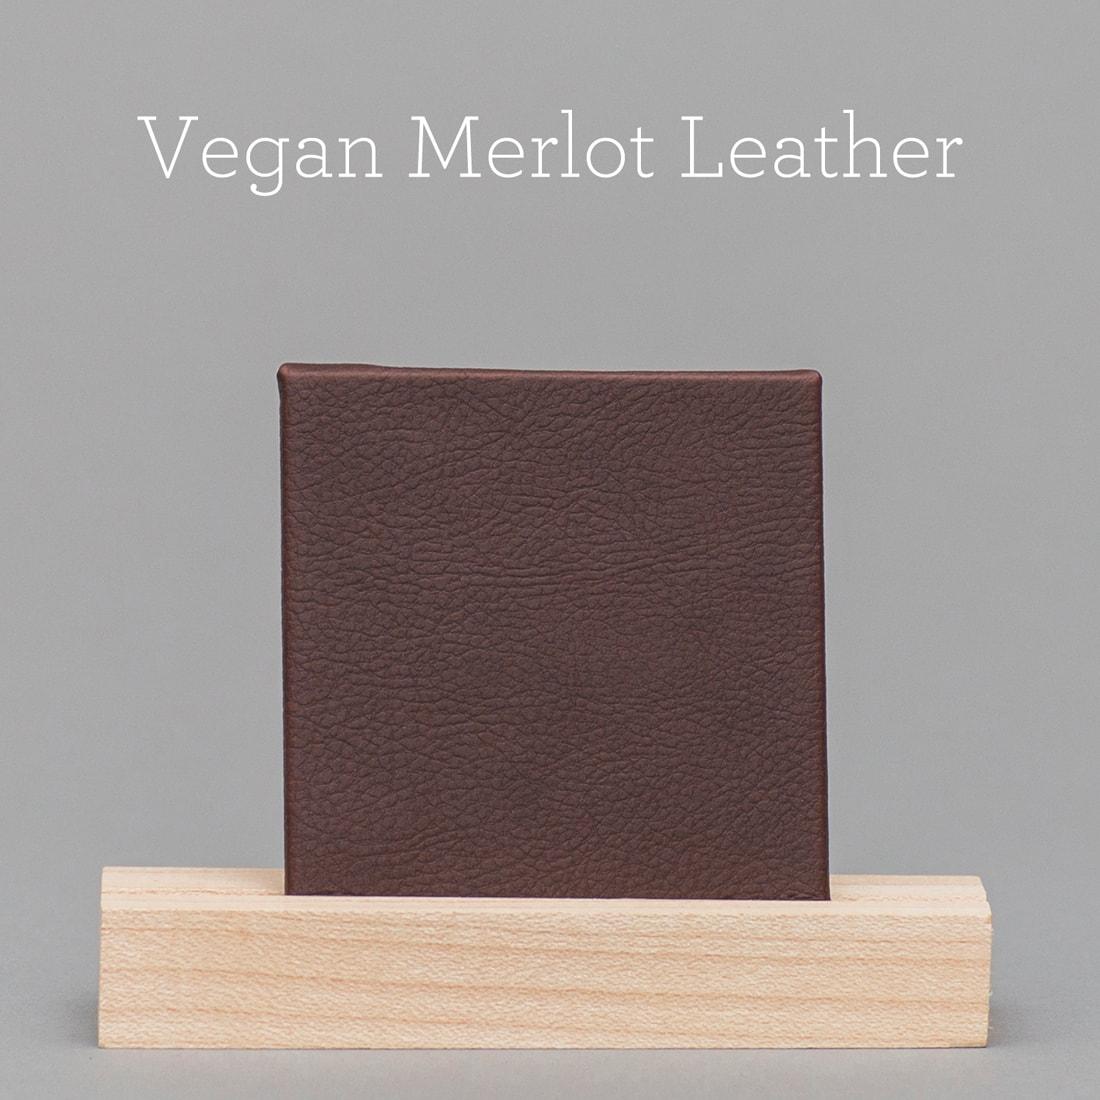 MerlotLeather.jpg